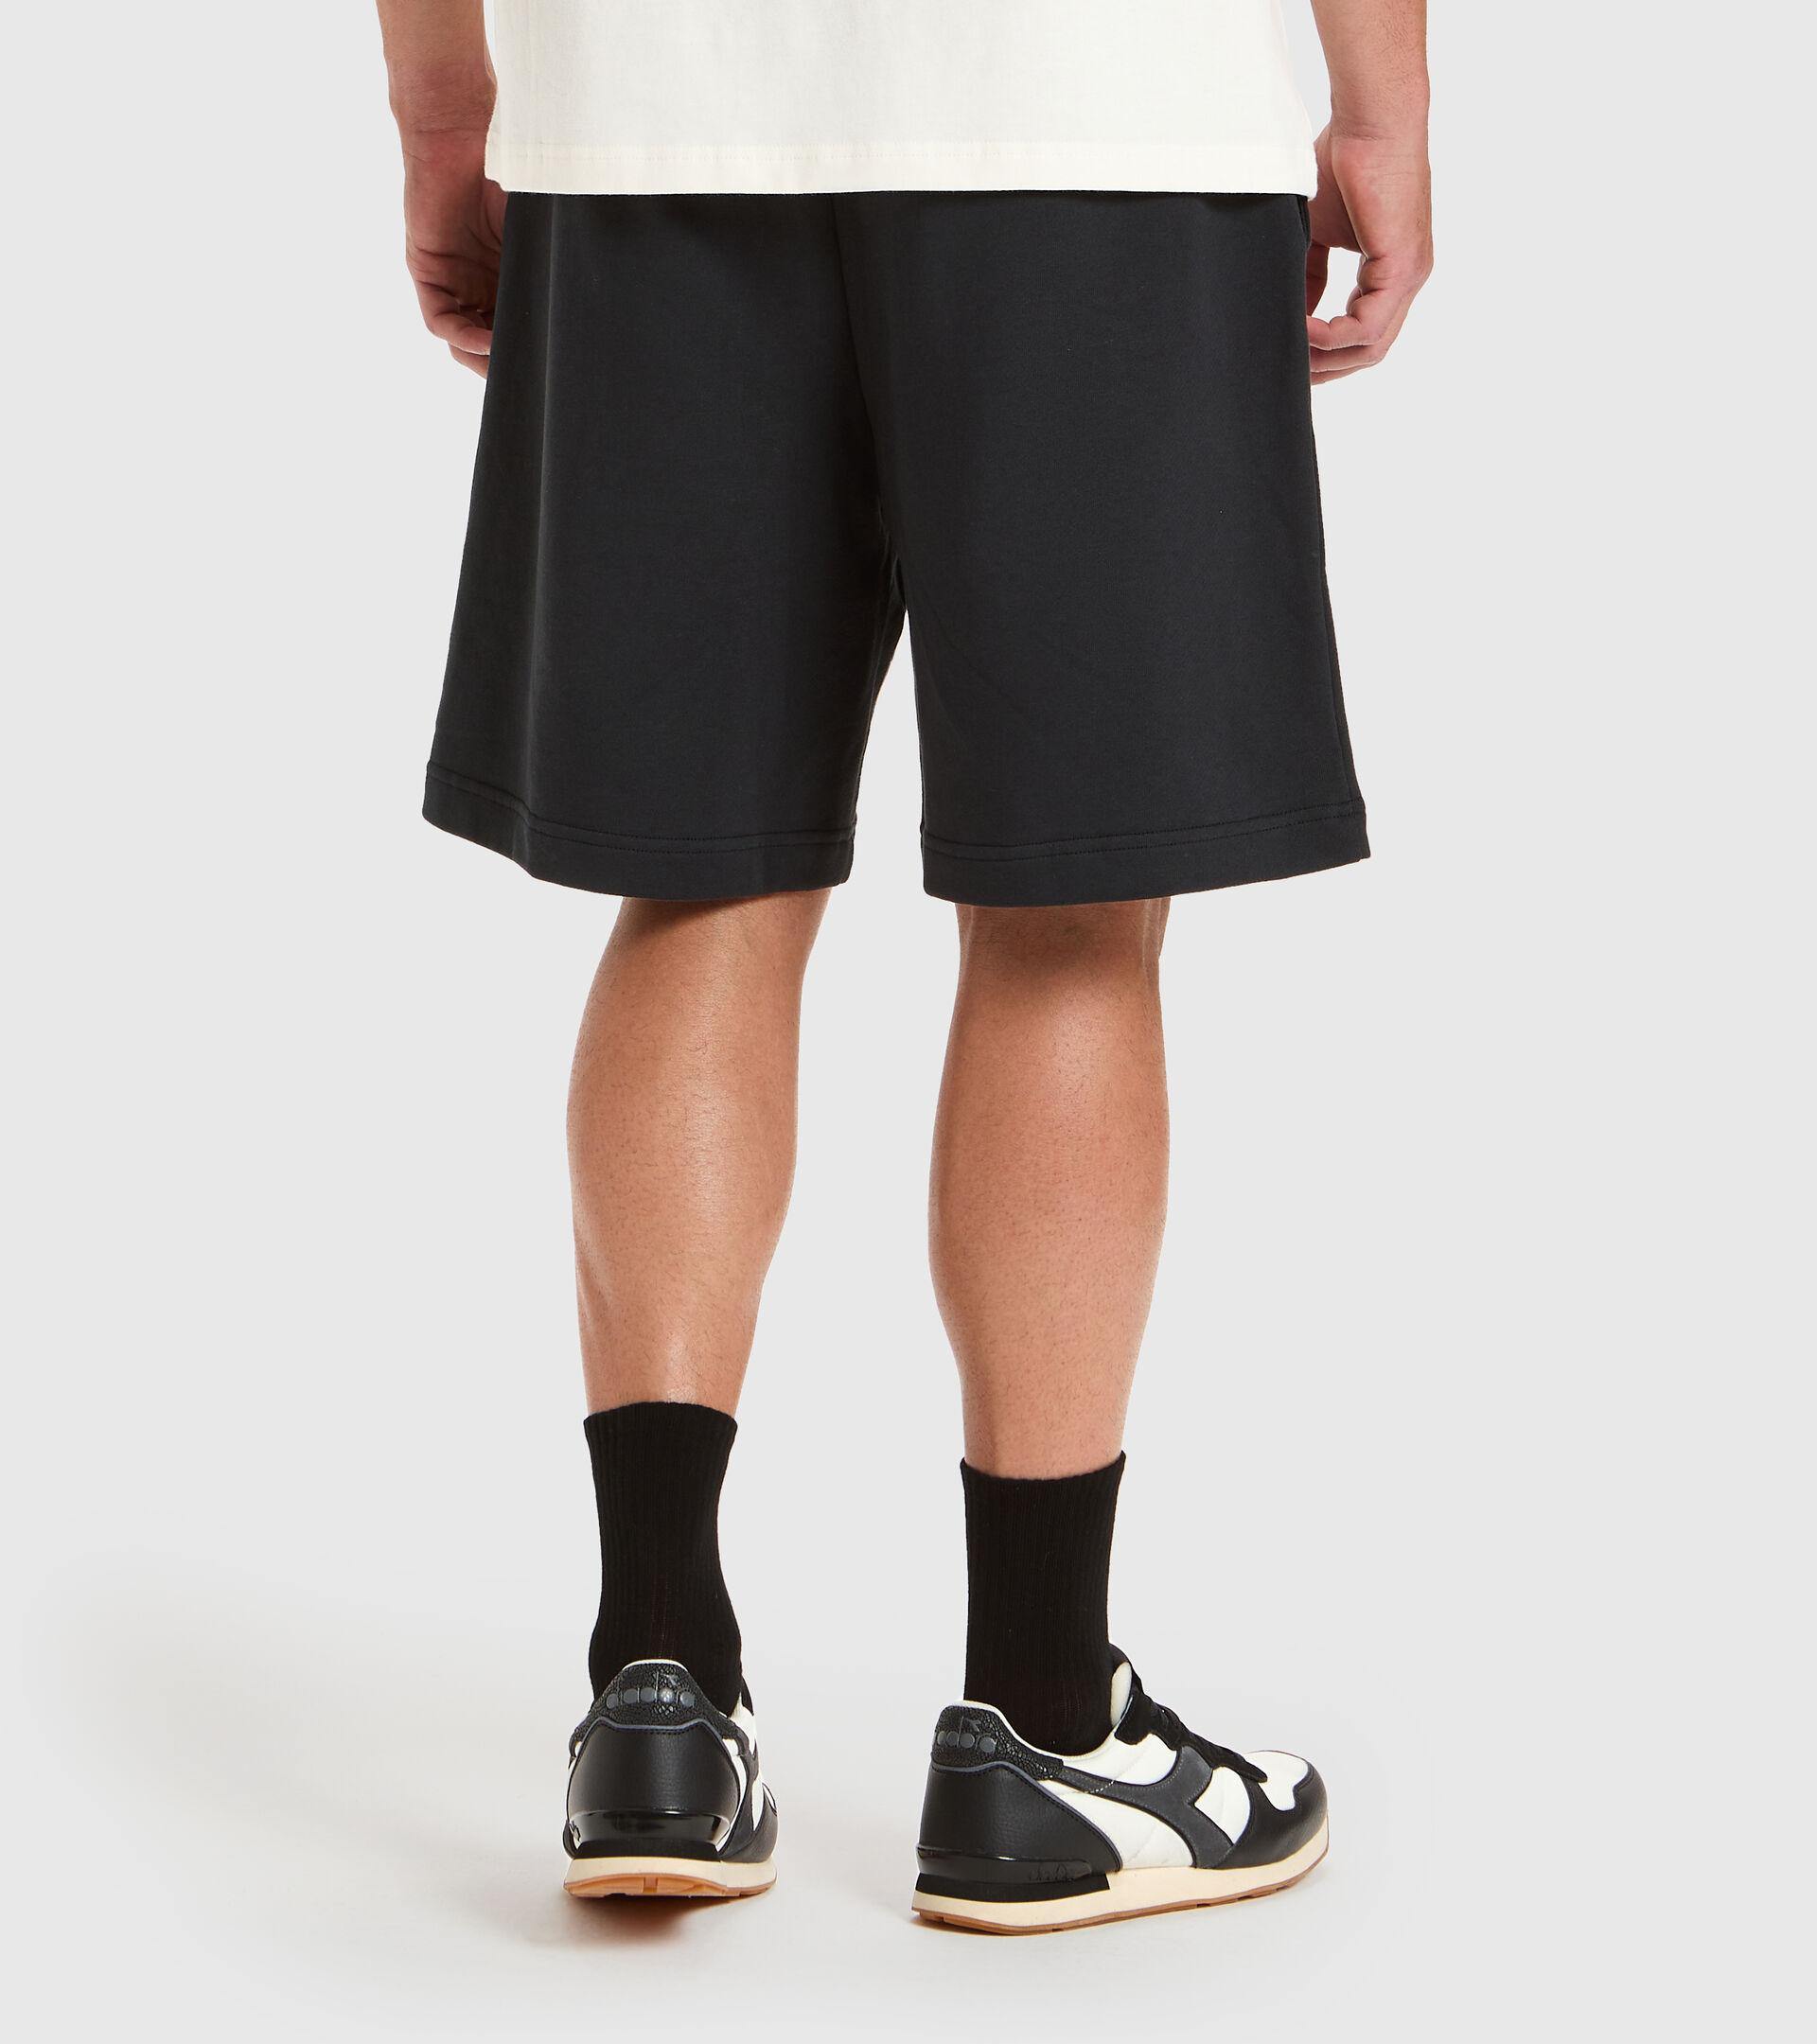 Apparel Sportswear UOMO BERMUDA ICON NEGRO Diadora